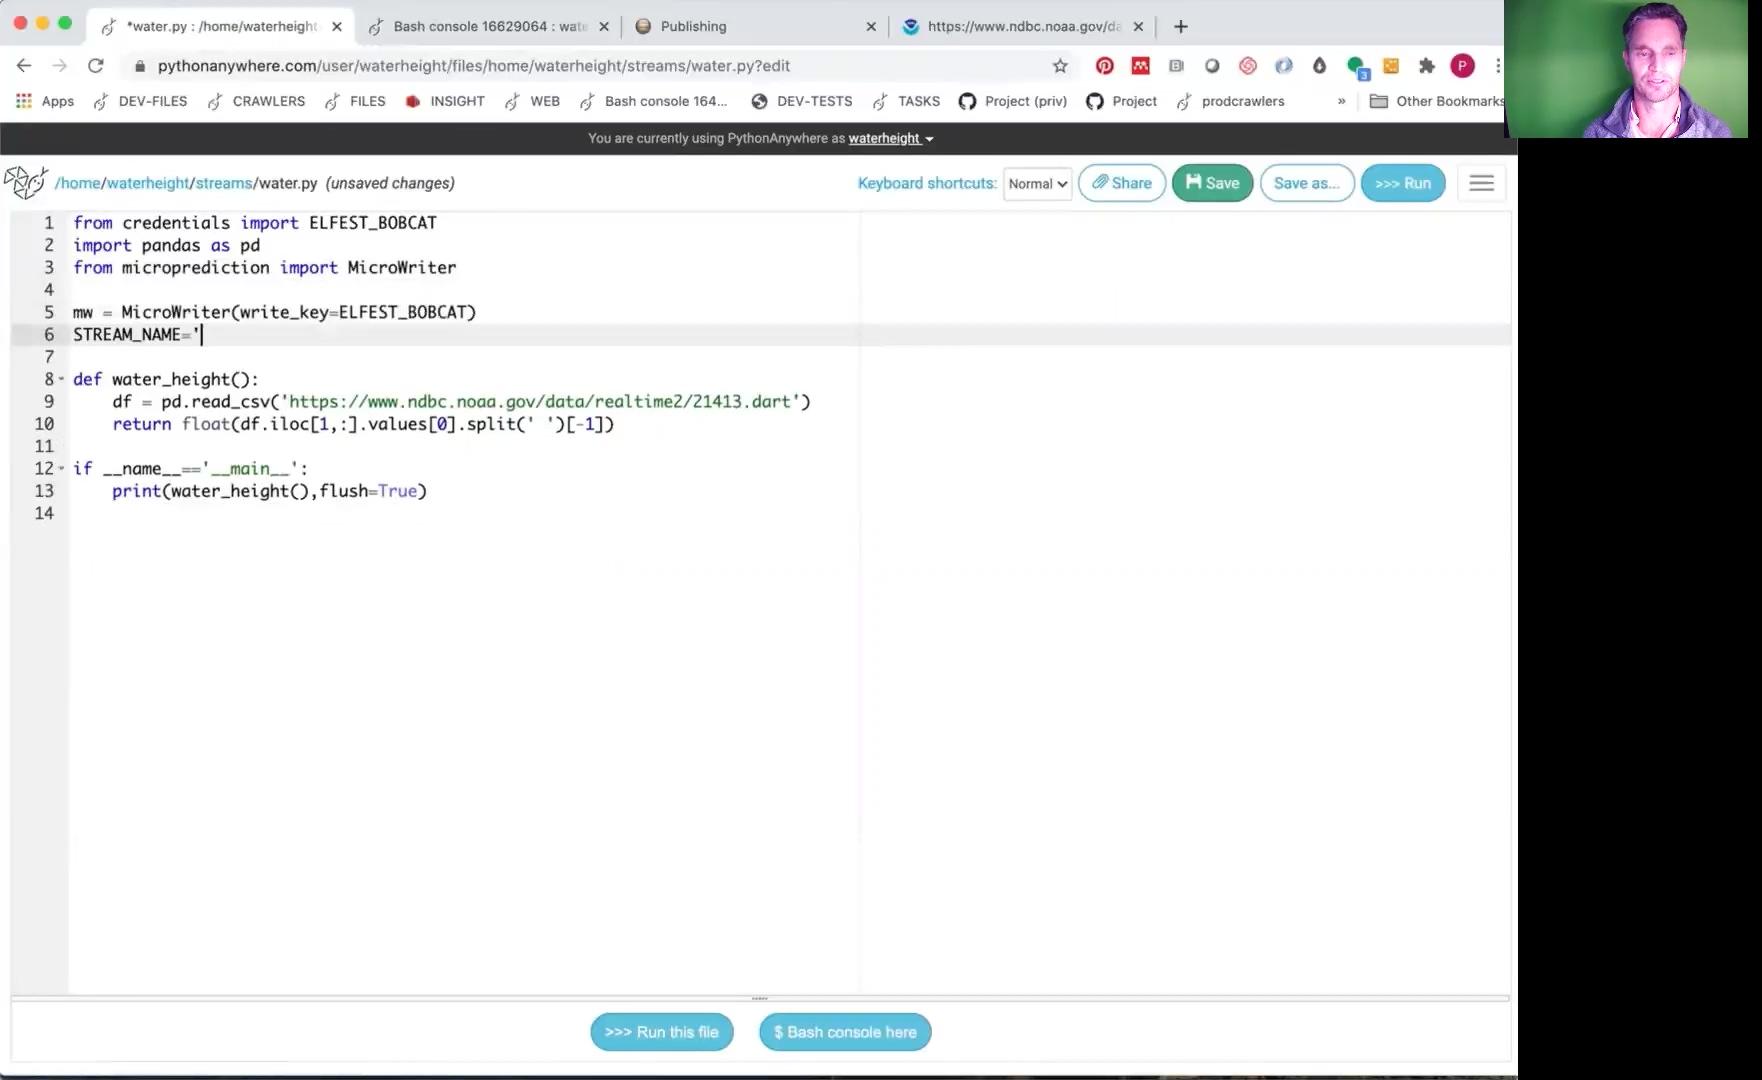 python_module_4_creating_a_stream